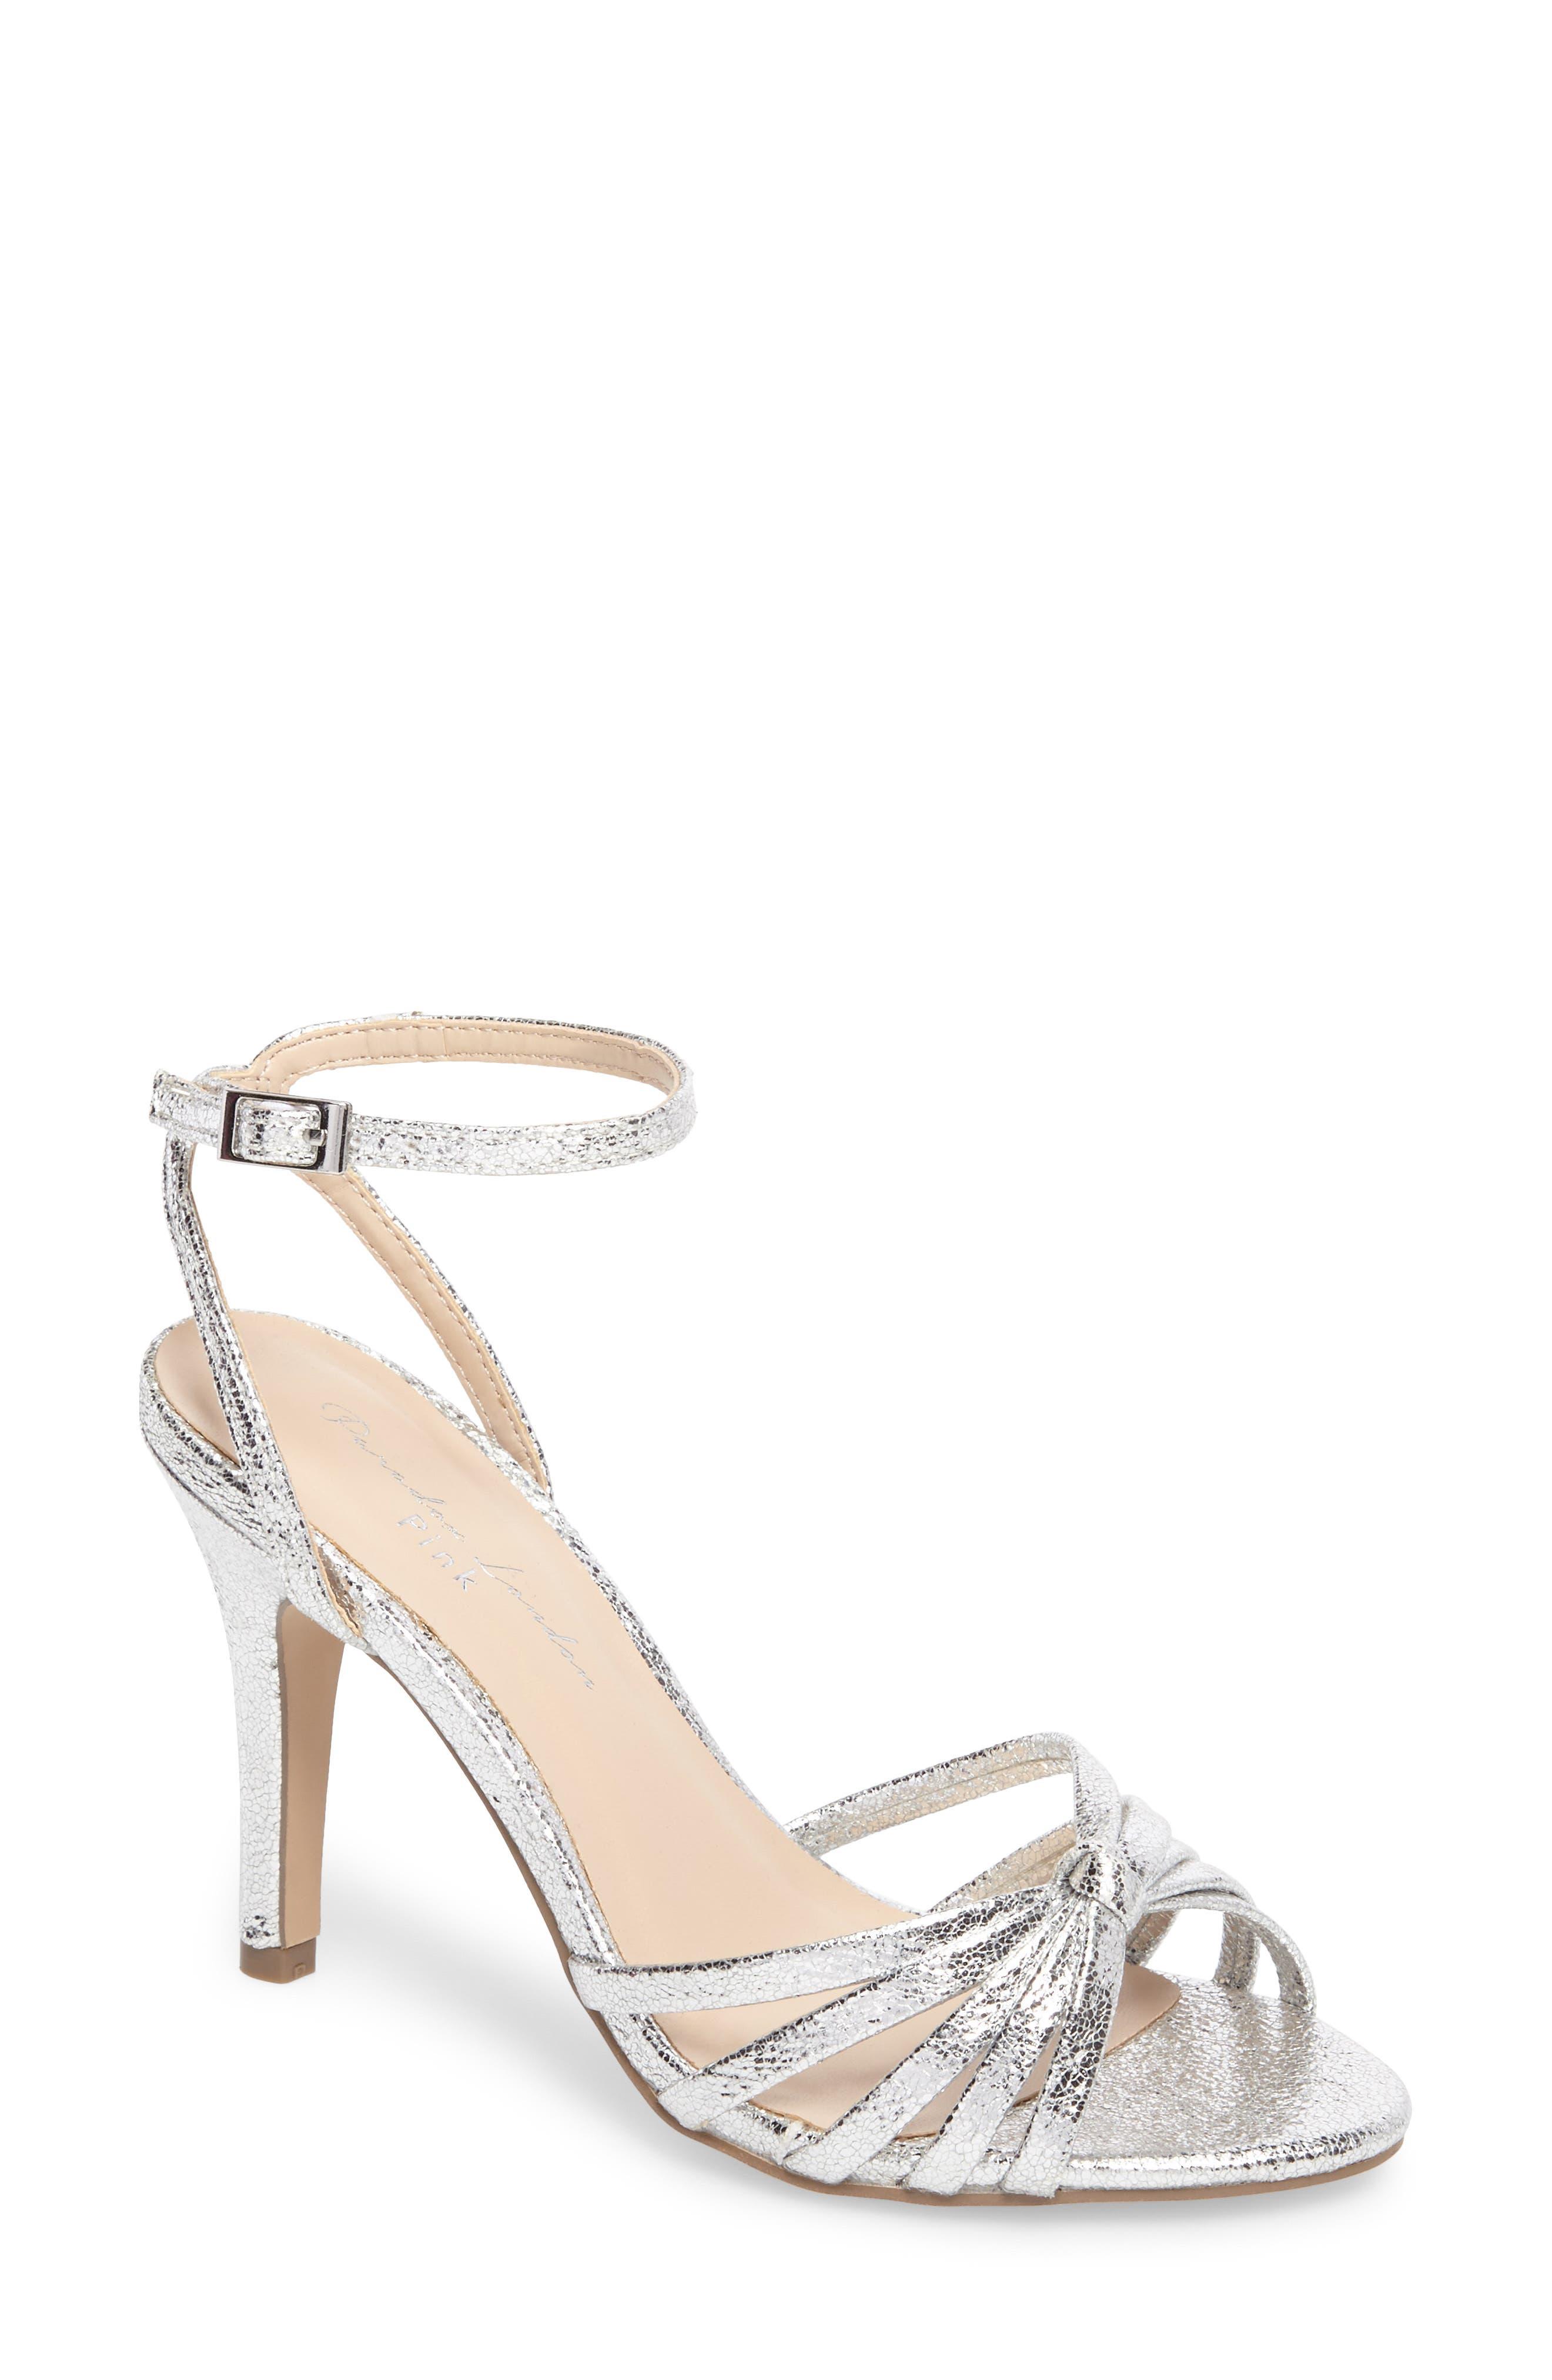 Mady Sandal,                             Main thumbnail 1, color,                             Silver Glitter